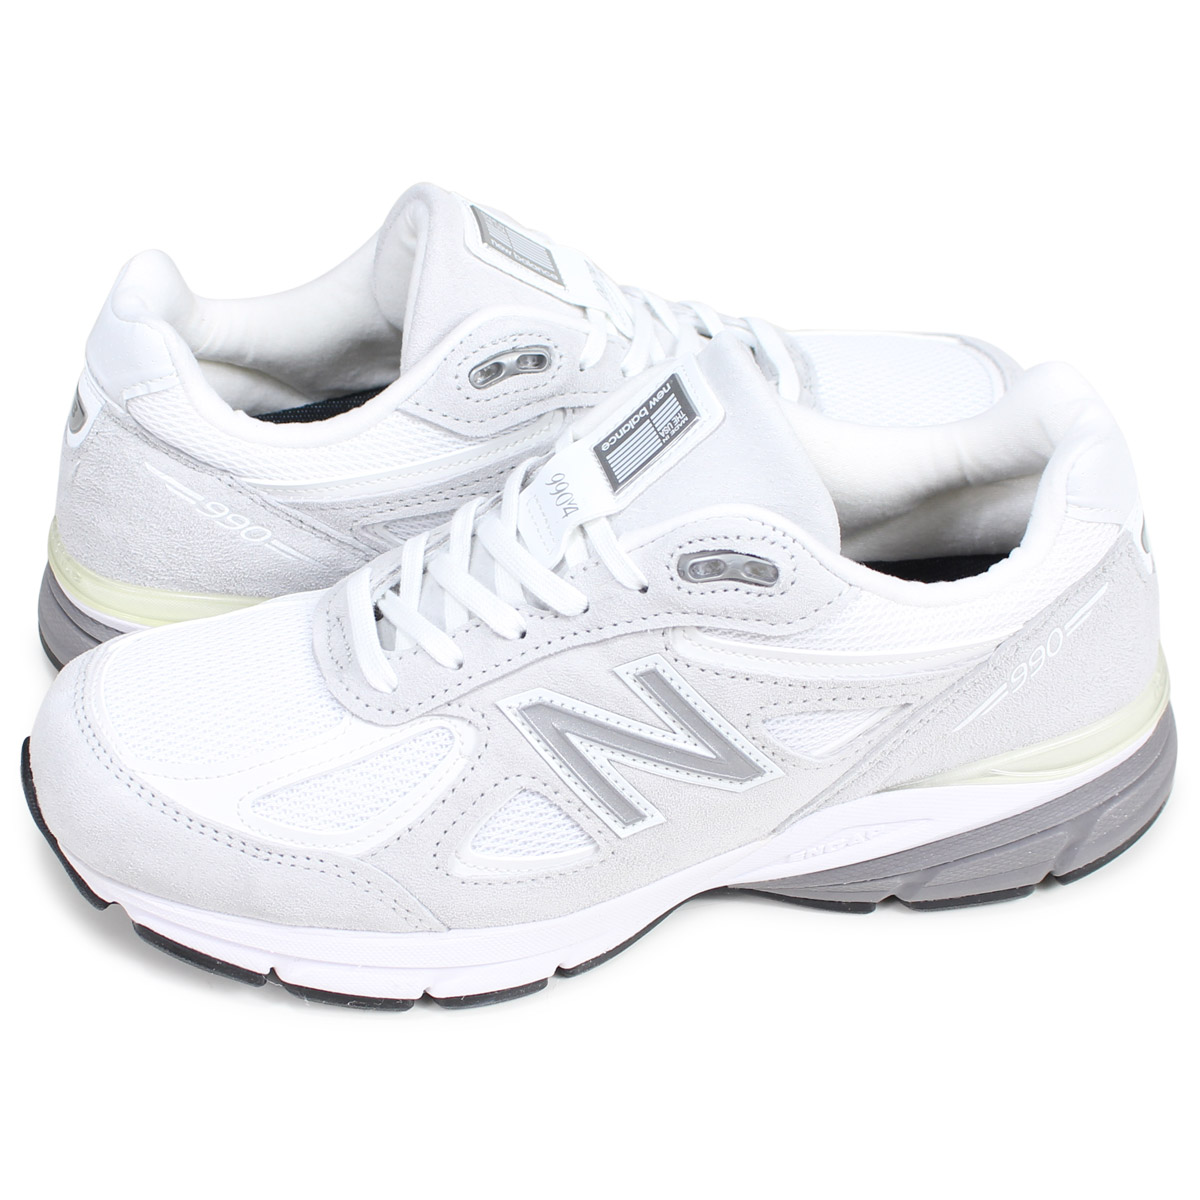 more photos bd065 6073e new balance M990JUA4 New Balance 990 sneakers men gap Dis D Wise MADE IN  USA white white [193]